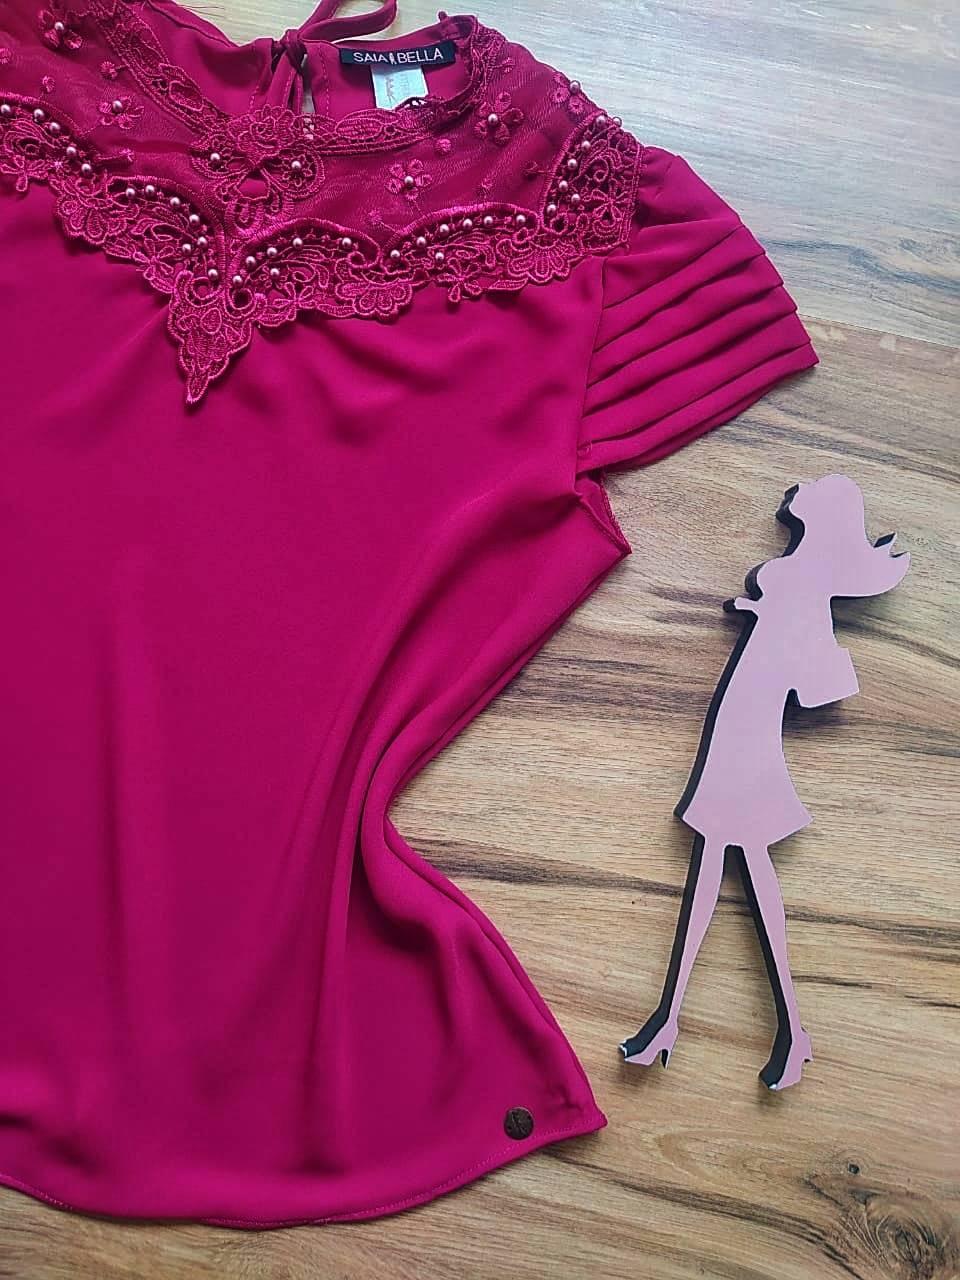 Blusa de Renda Lizandra Saia Bella  SB9983 Purpura